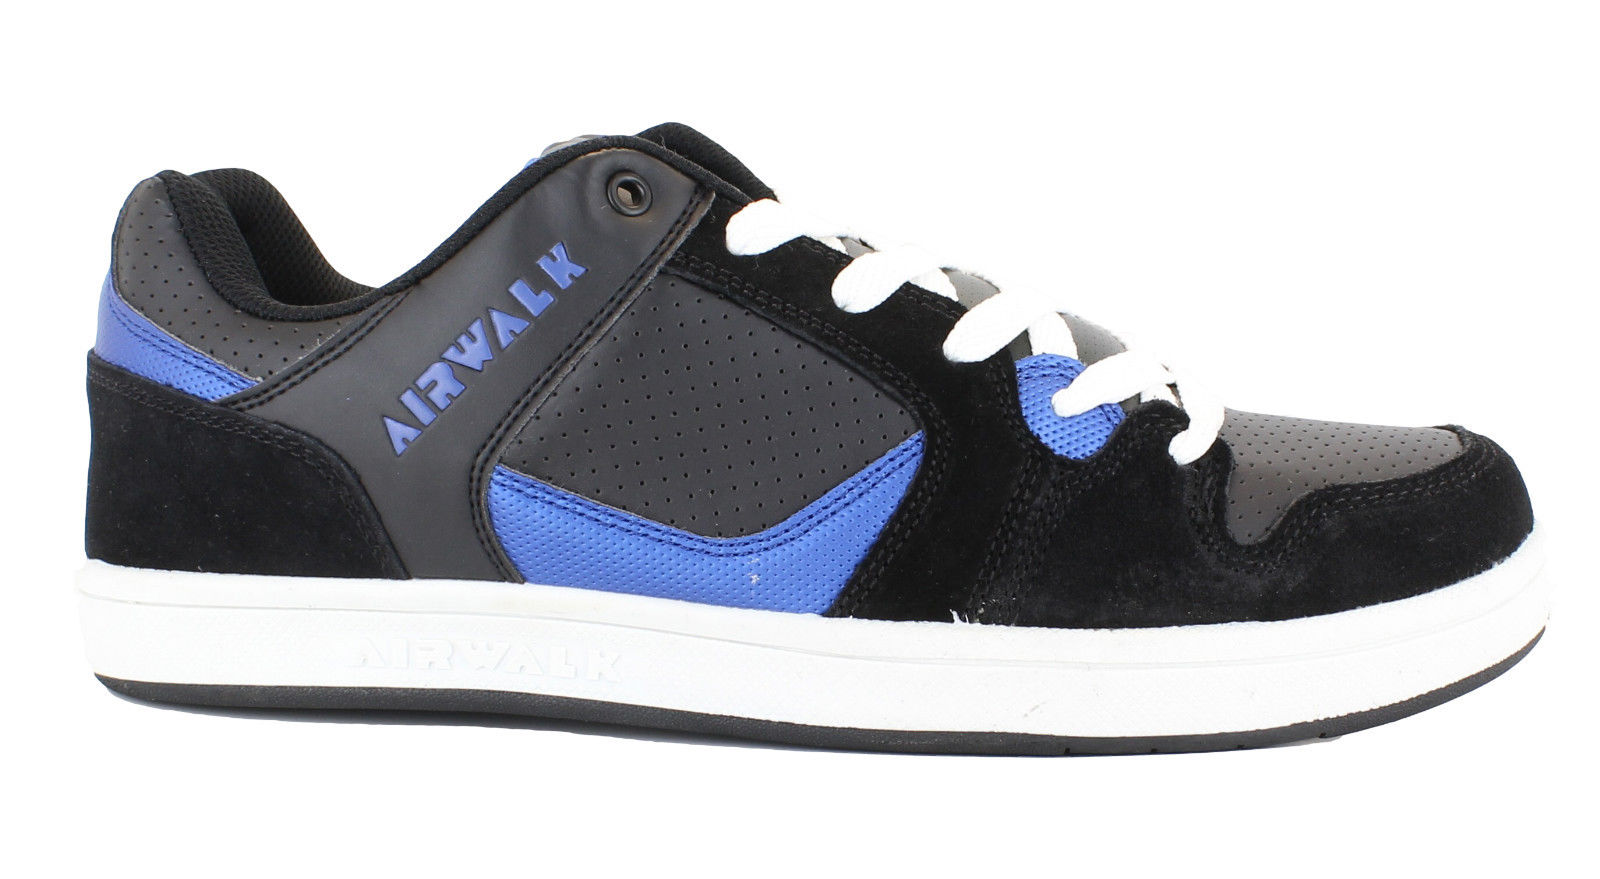 airwalk metalhead mens black and blue lace up skate